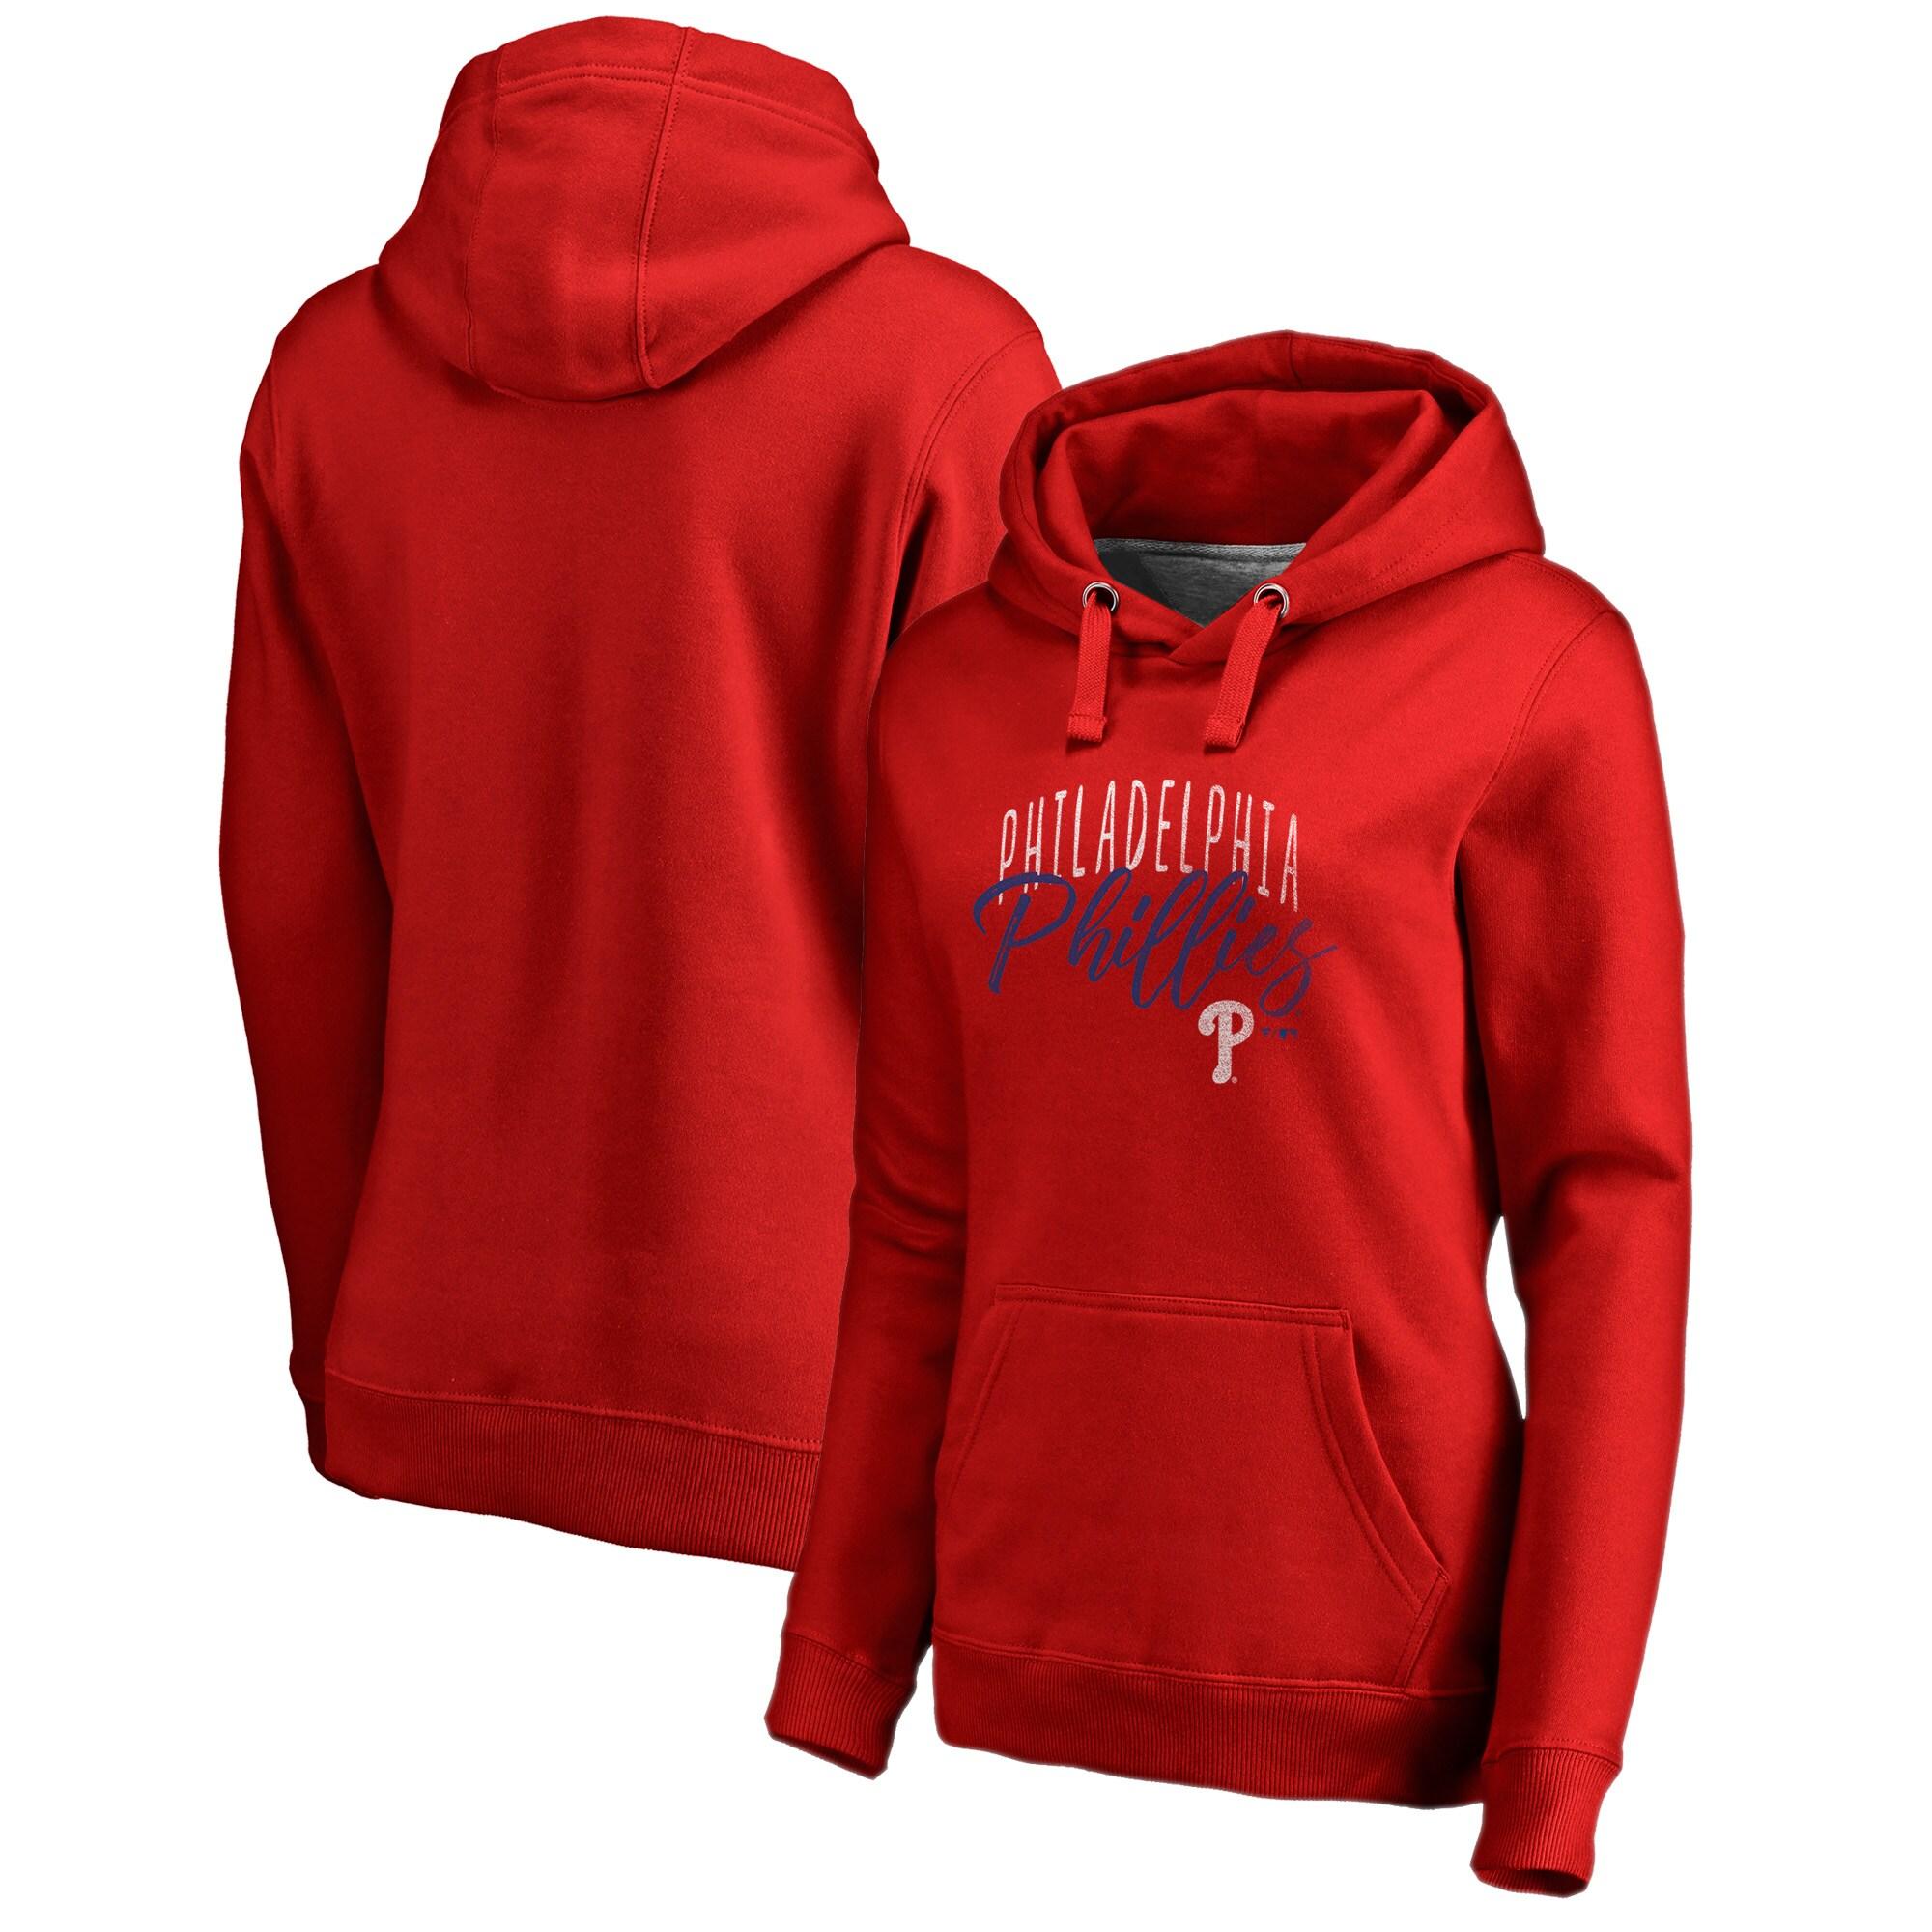 Philadelphia Phillies Fanatics Branded Women's Graceful Pullover Hoodie - Red